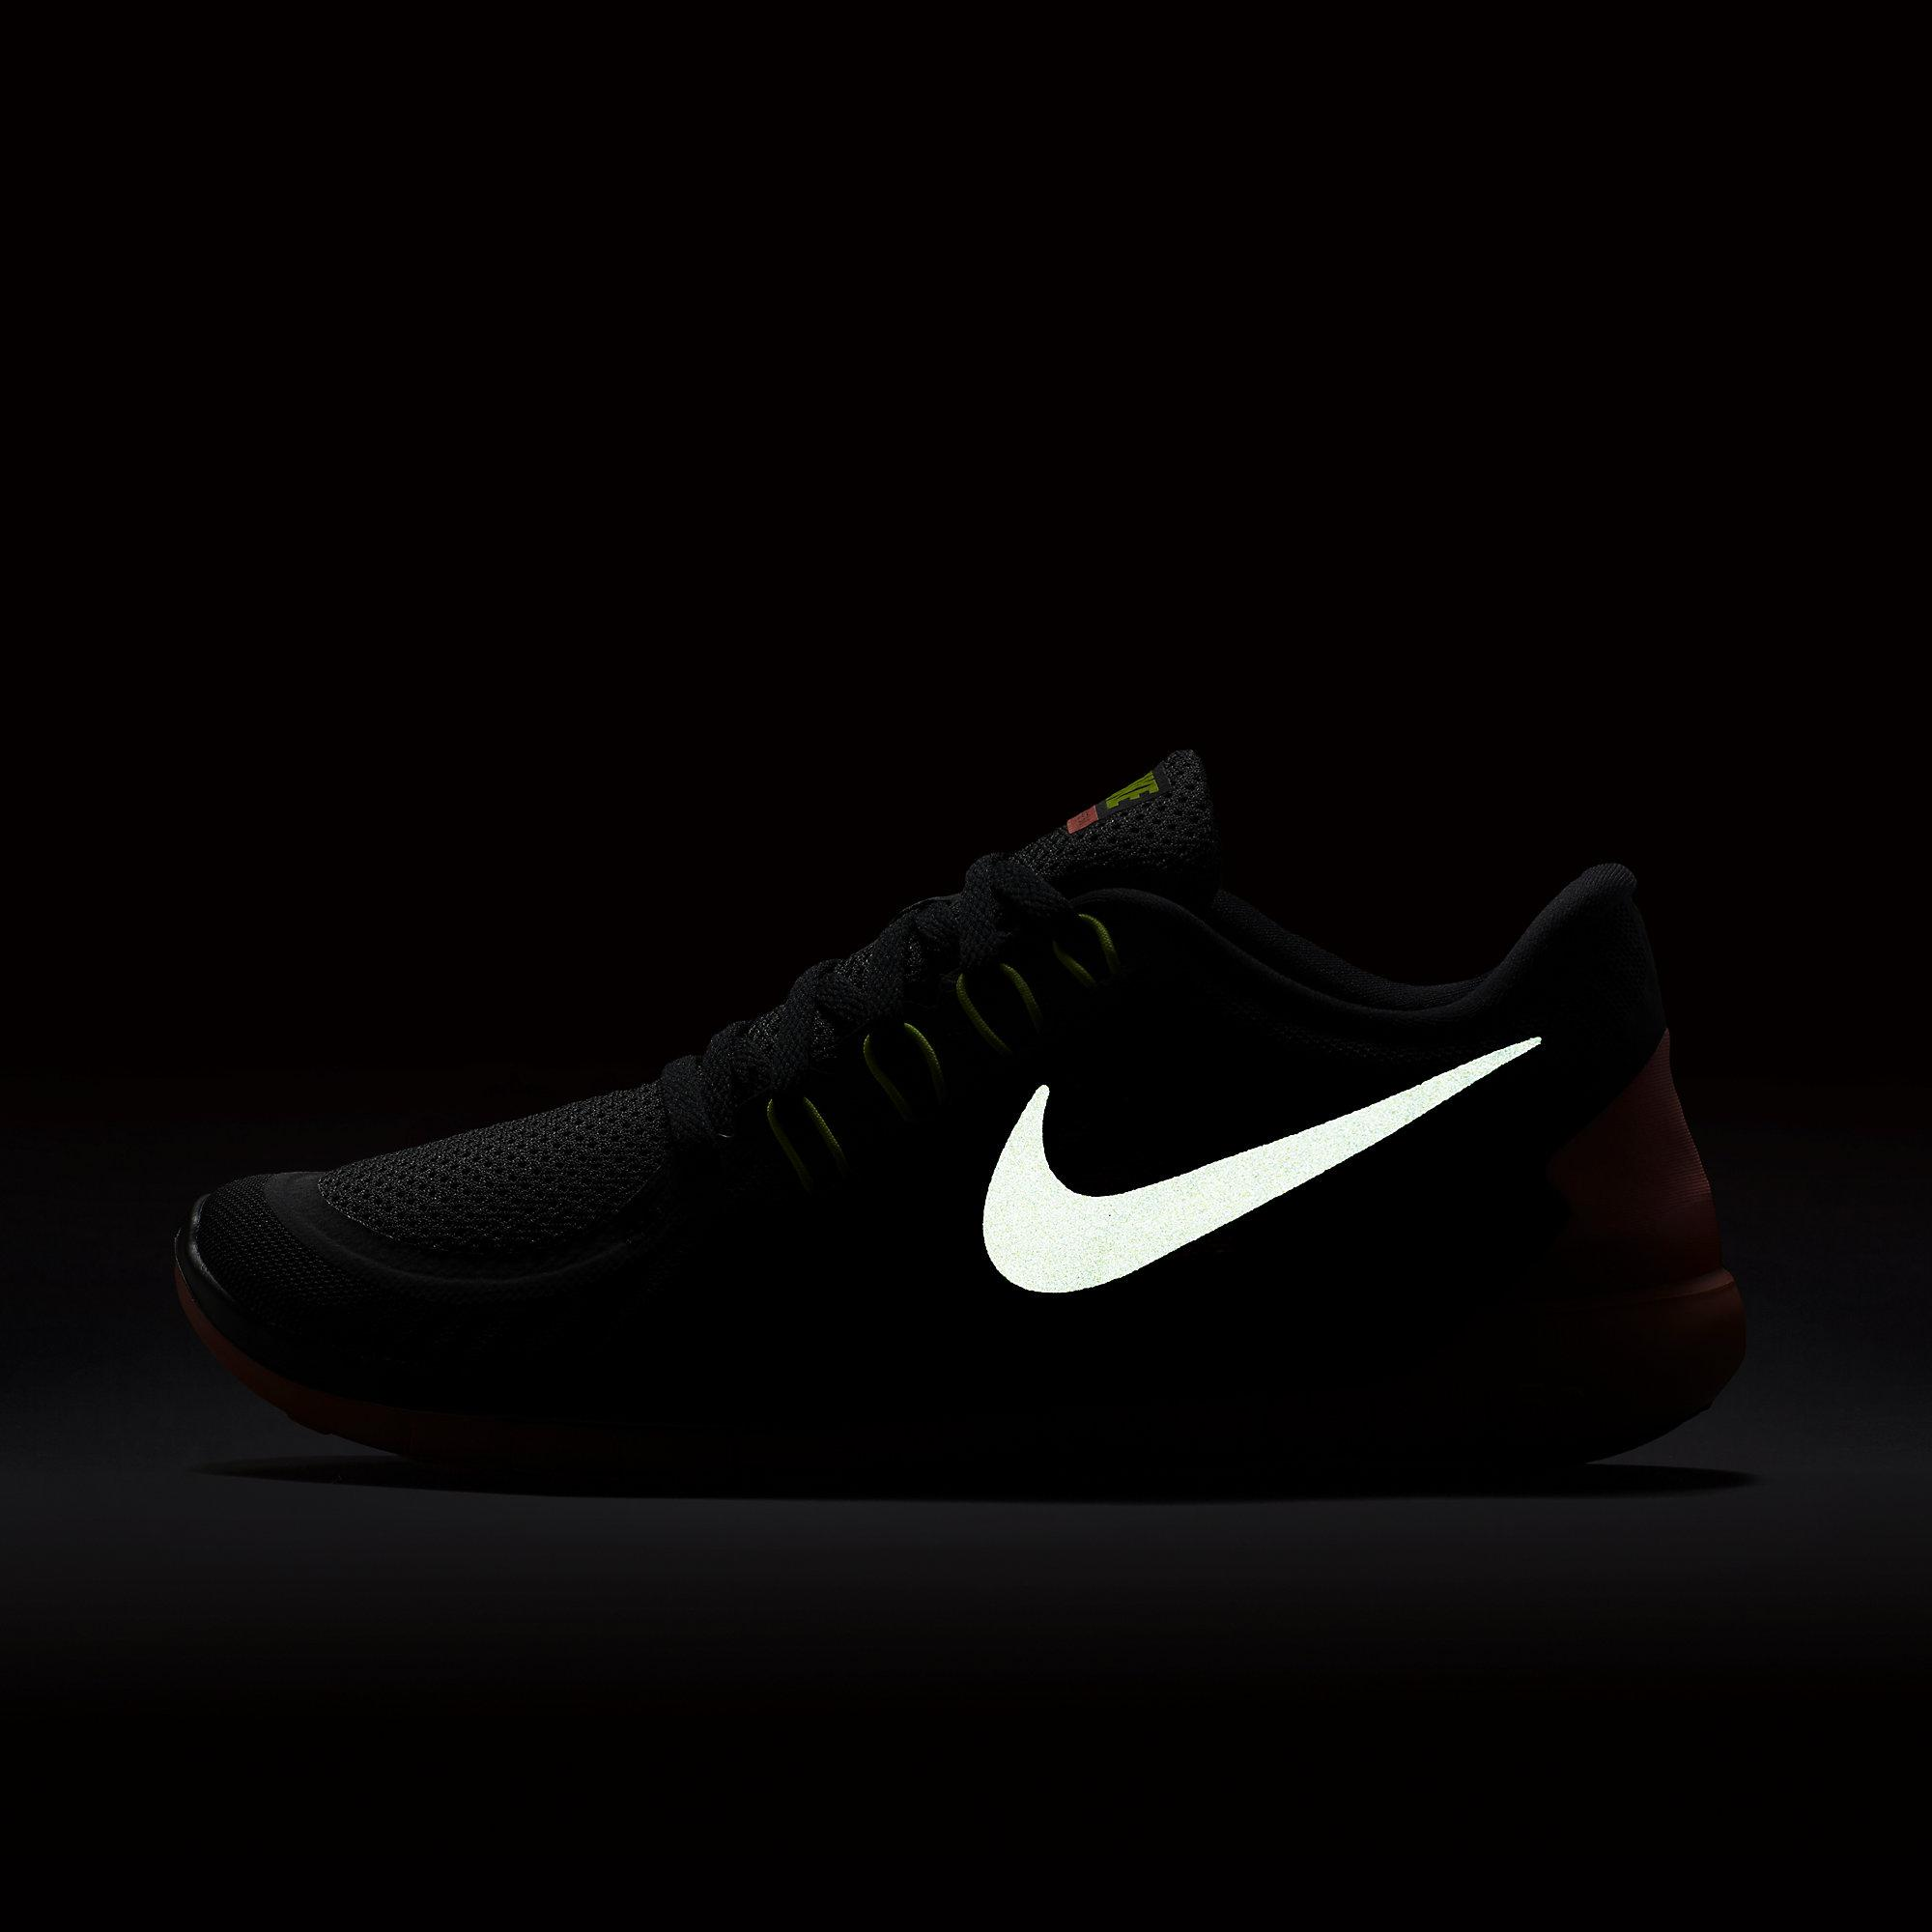 quemar canal mecánico  Nike Womens Free 5.0 Running Shoes - Black/Yellow/Mango - Tennisnuts.com